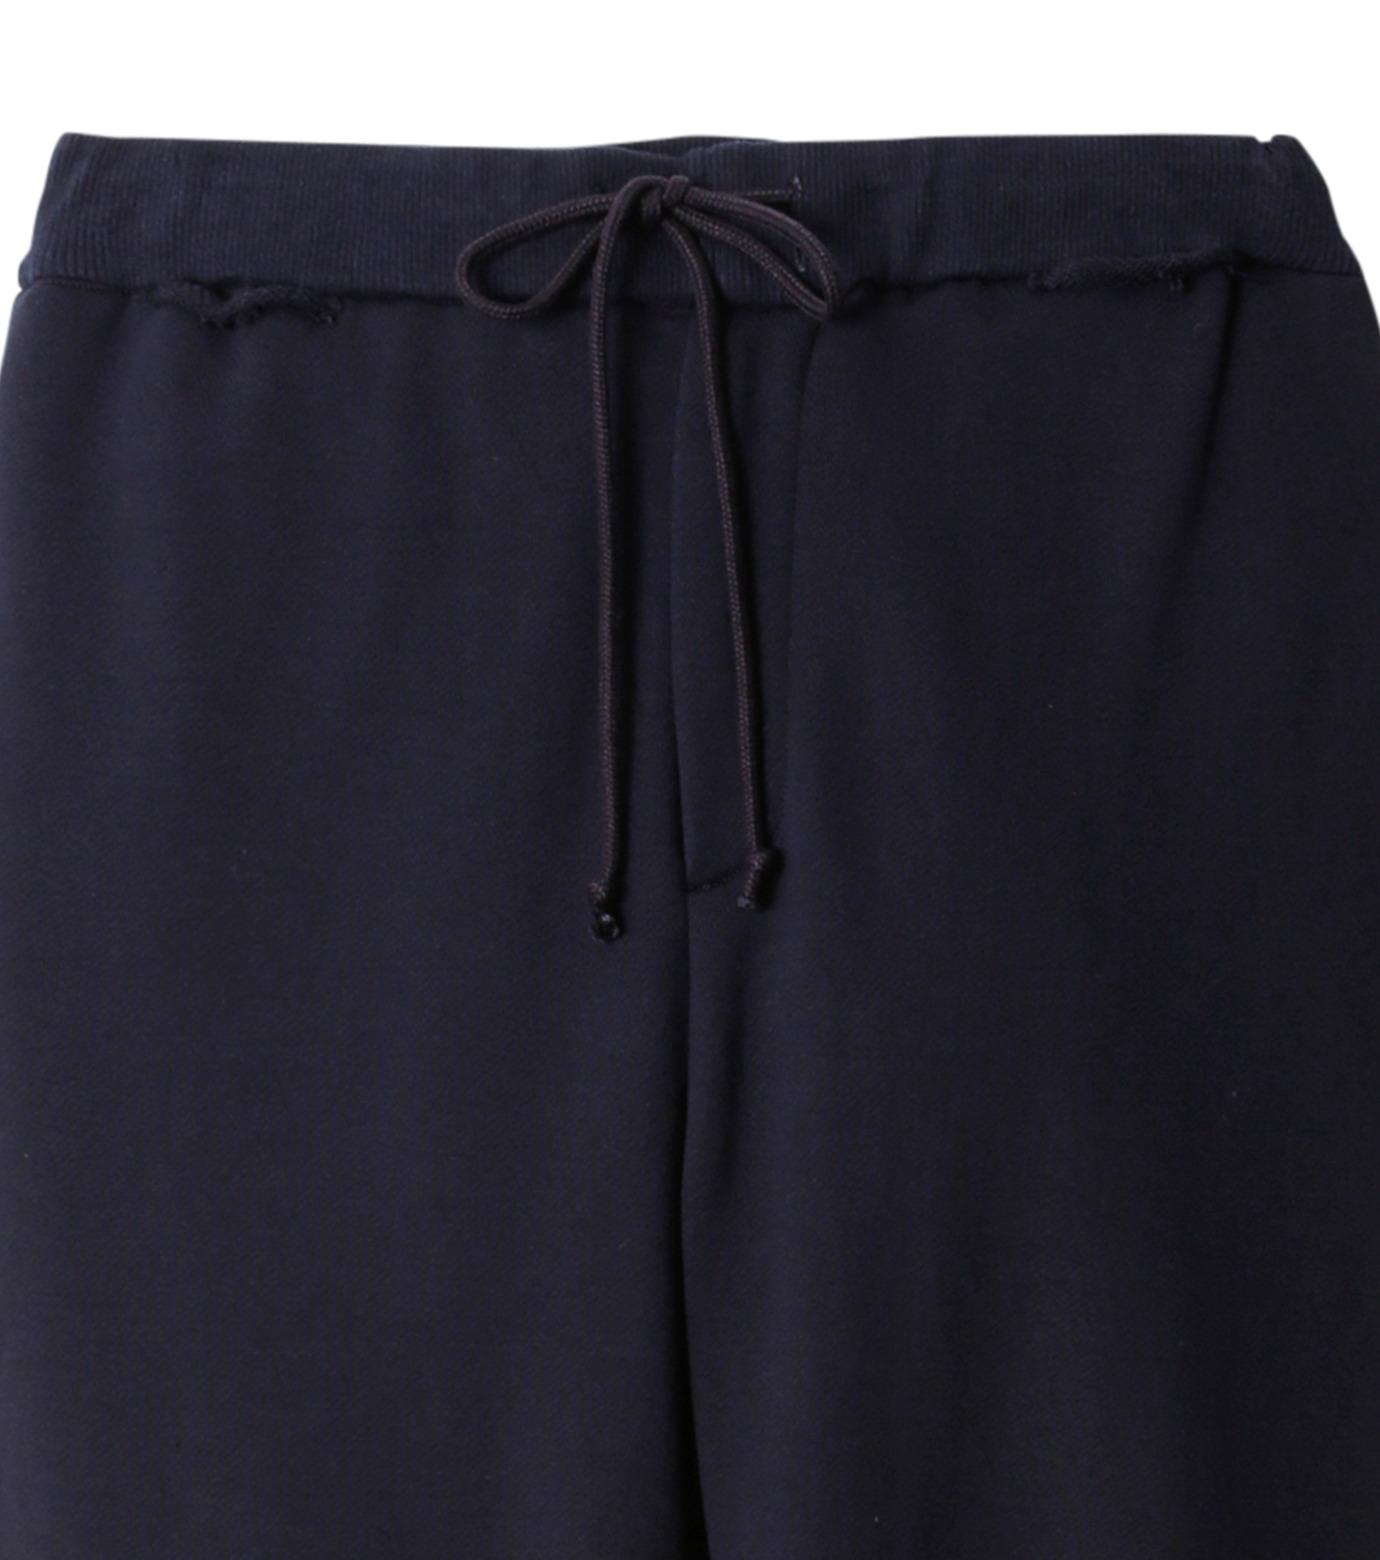 DRESSEDUNDRESSED(ドレスドアンドレスド)のCotton Damaged Trackpants-NAVY(パンツ/pants)-DUW16352-93 拡大詳細画像2